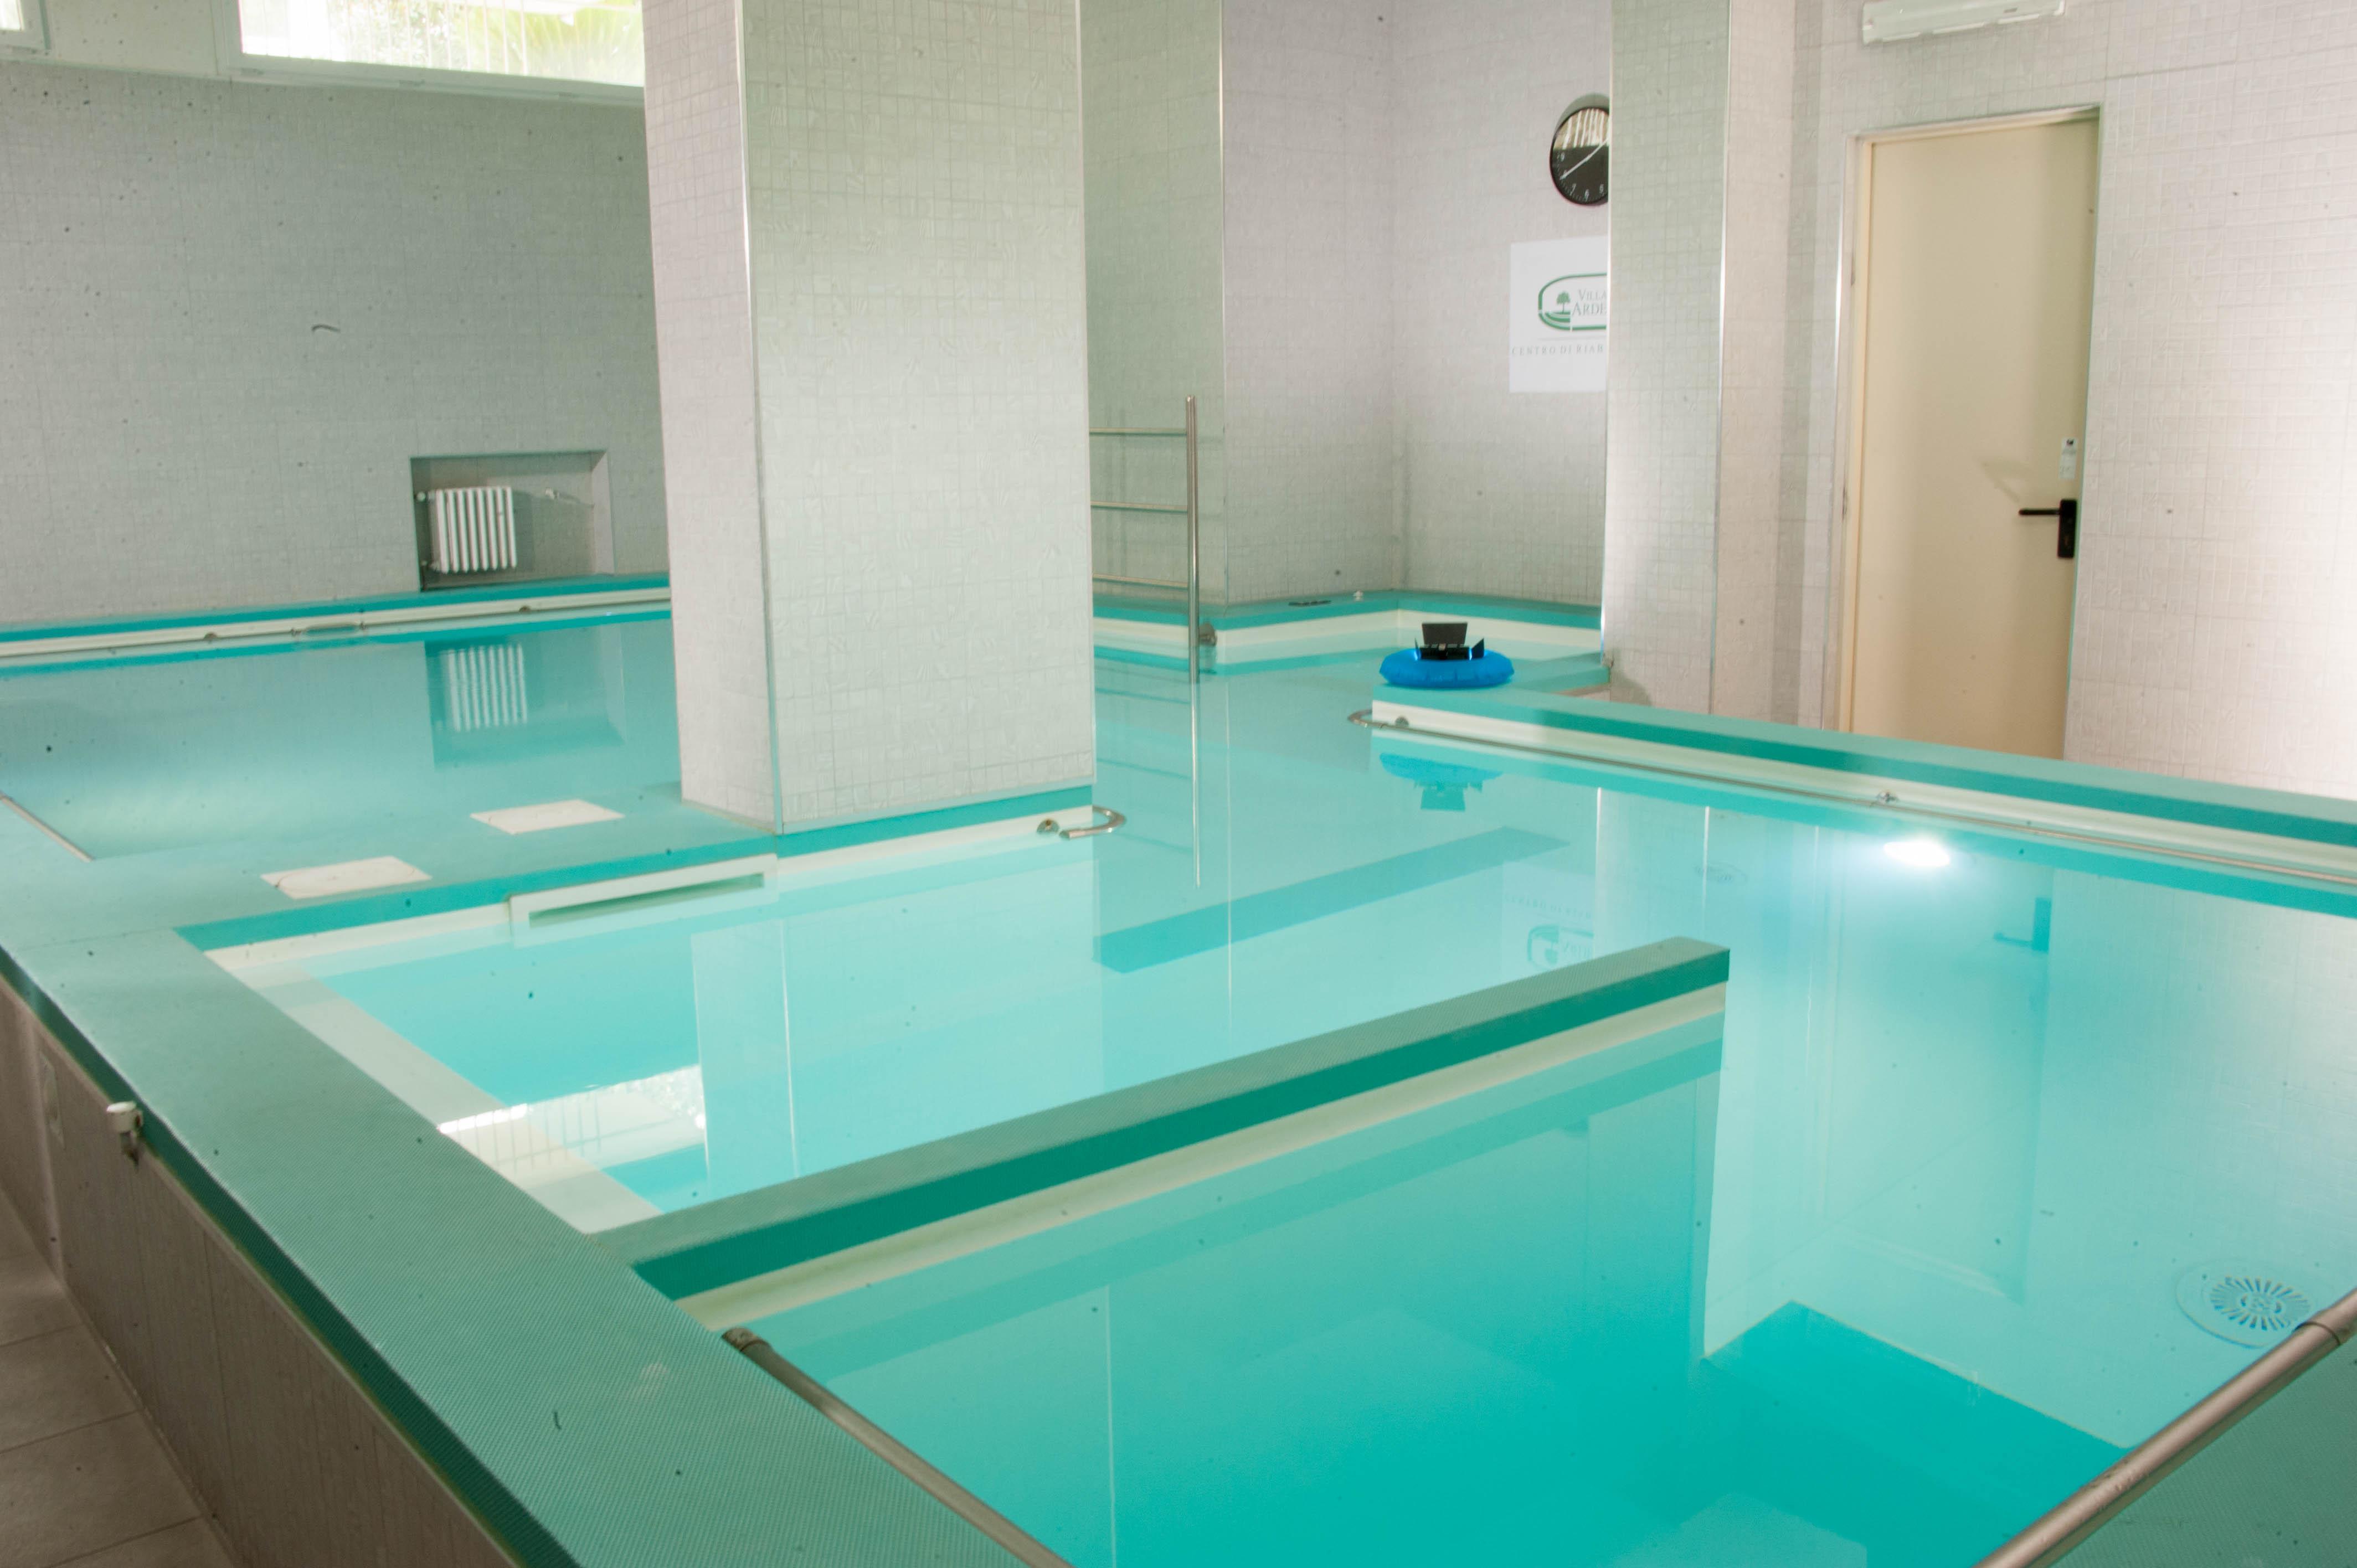 idrokinesiterapia piscina